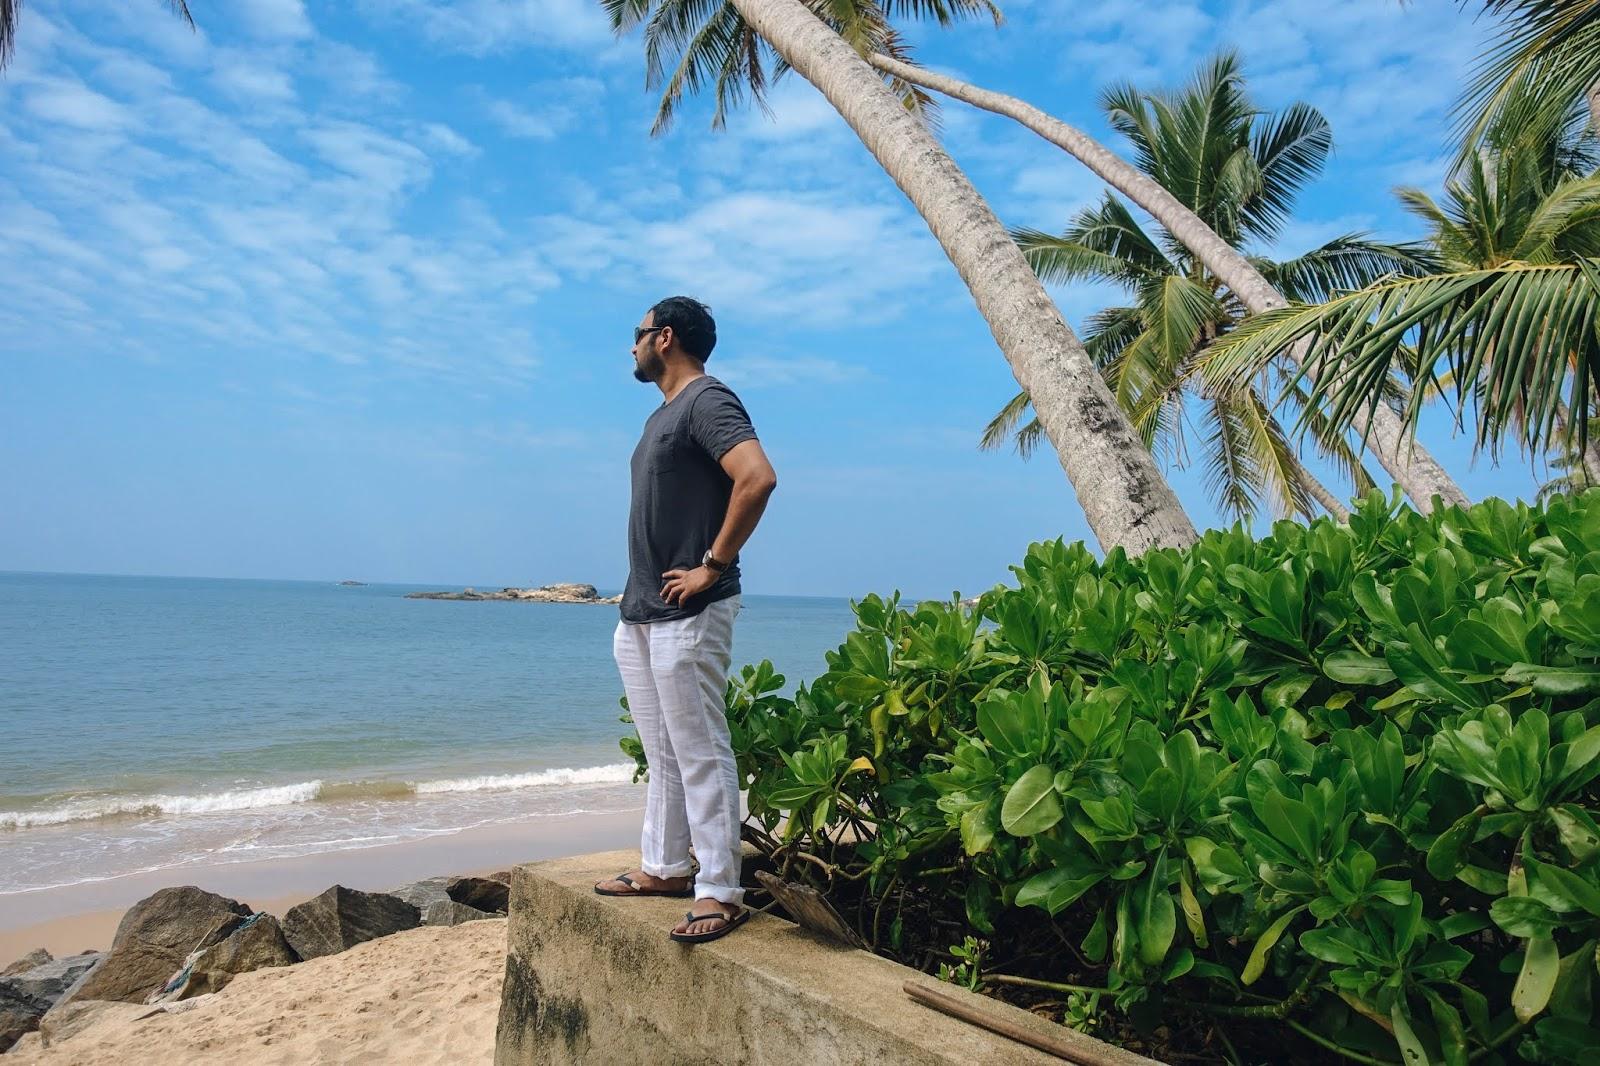 Modelling Sri Lanka